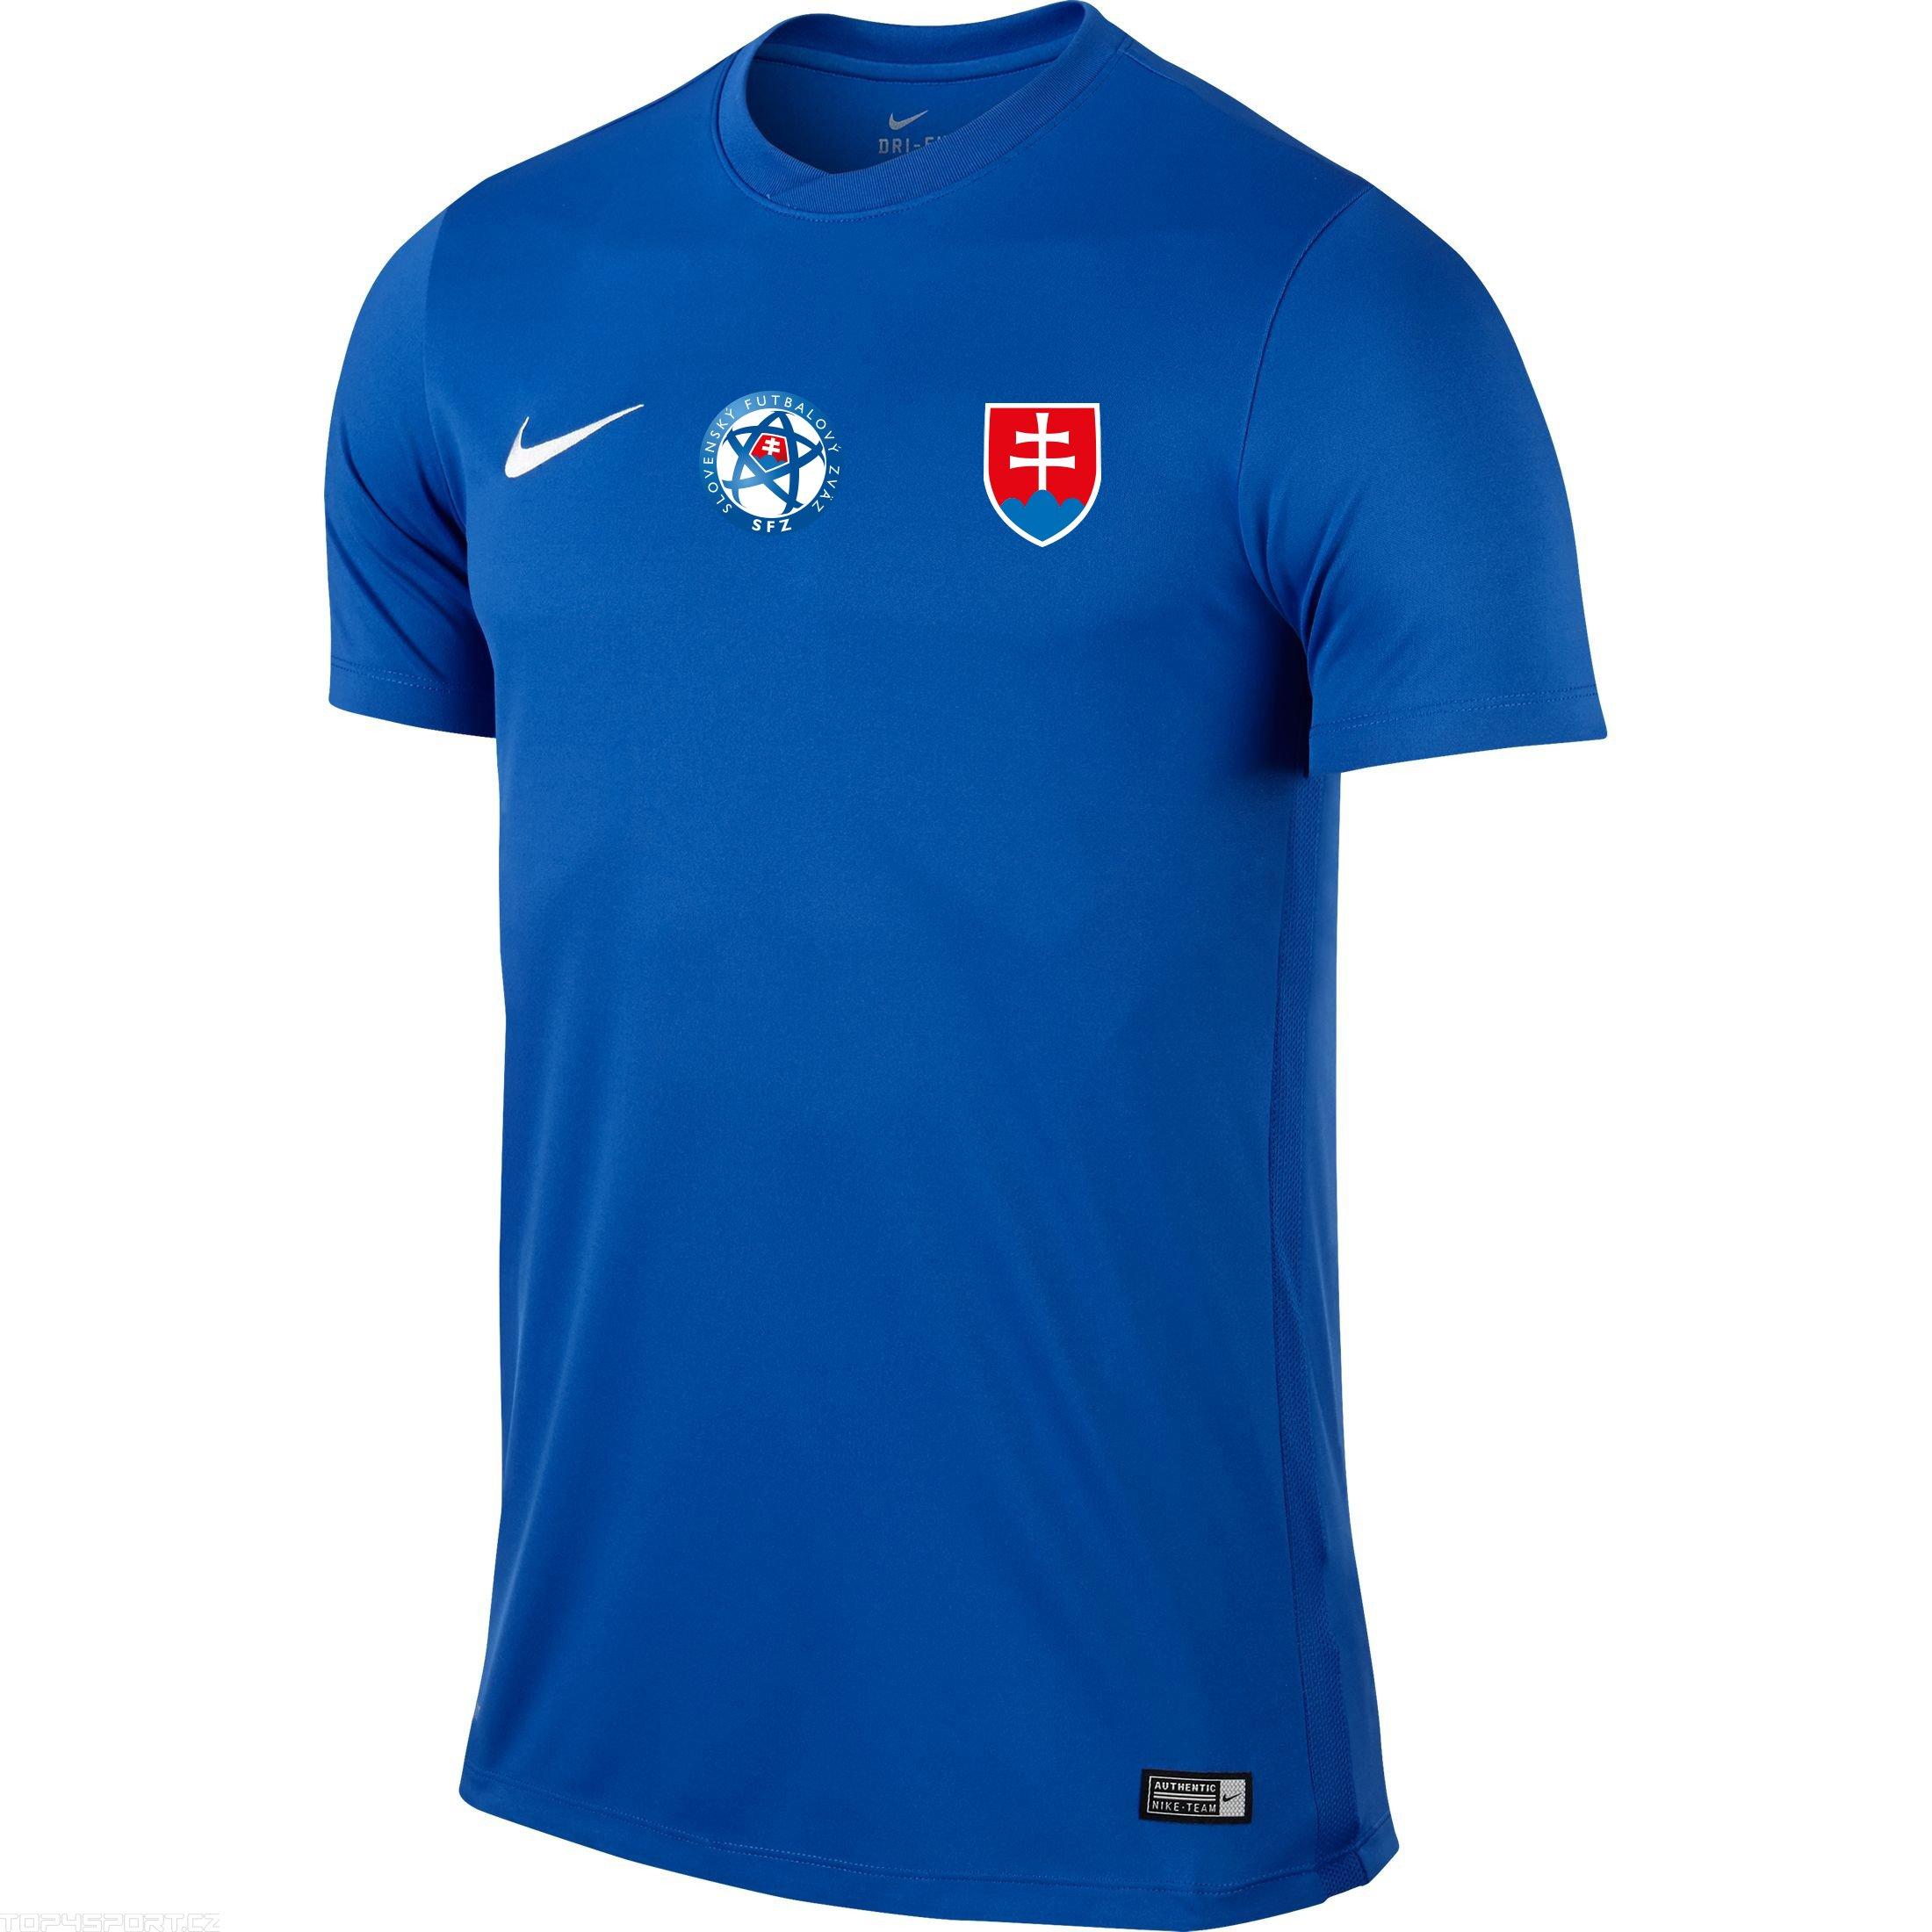 cf1519603 Futbalový dres SVK modrý NIKE replika DETSKÝ - Fanshop SB